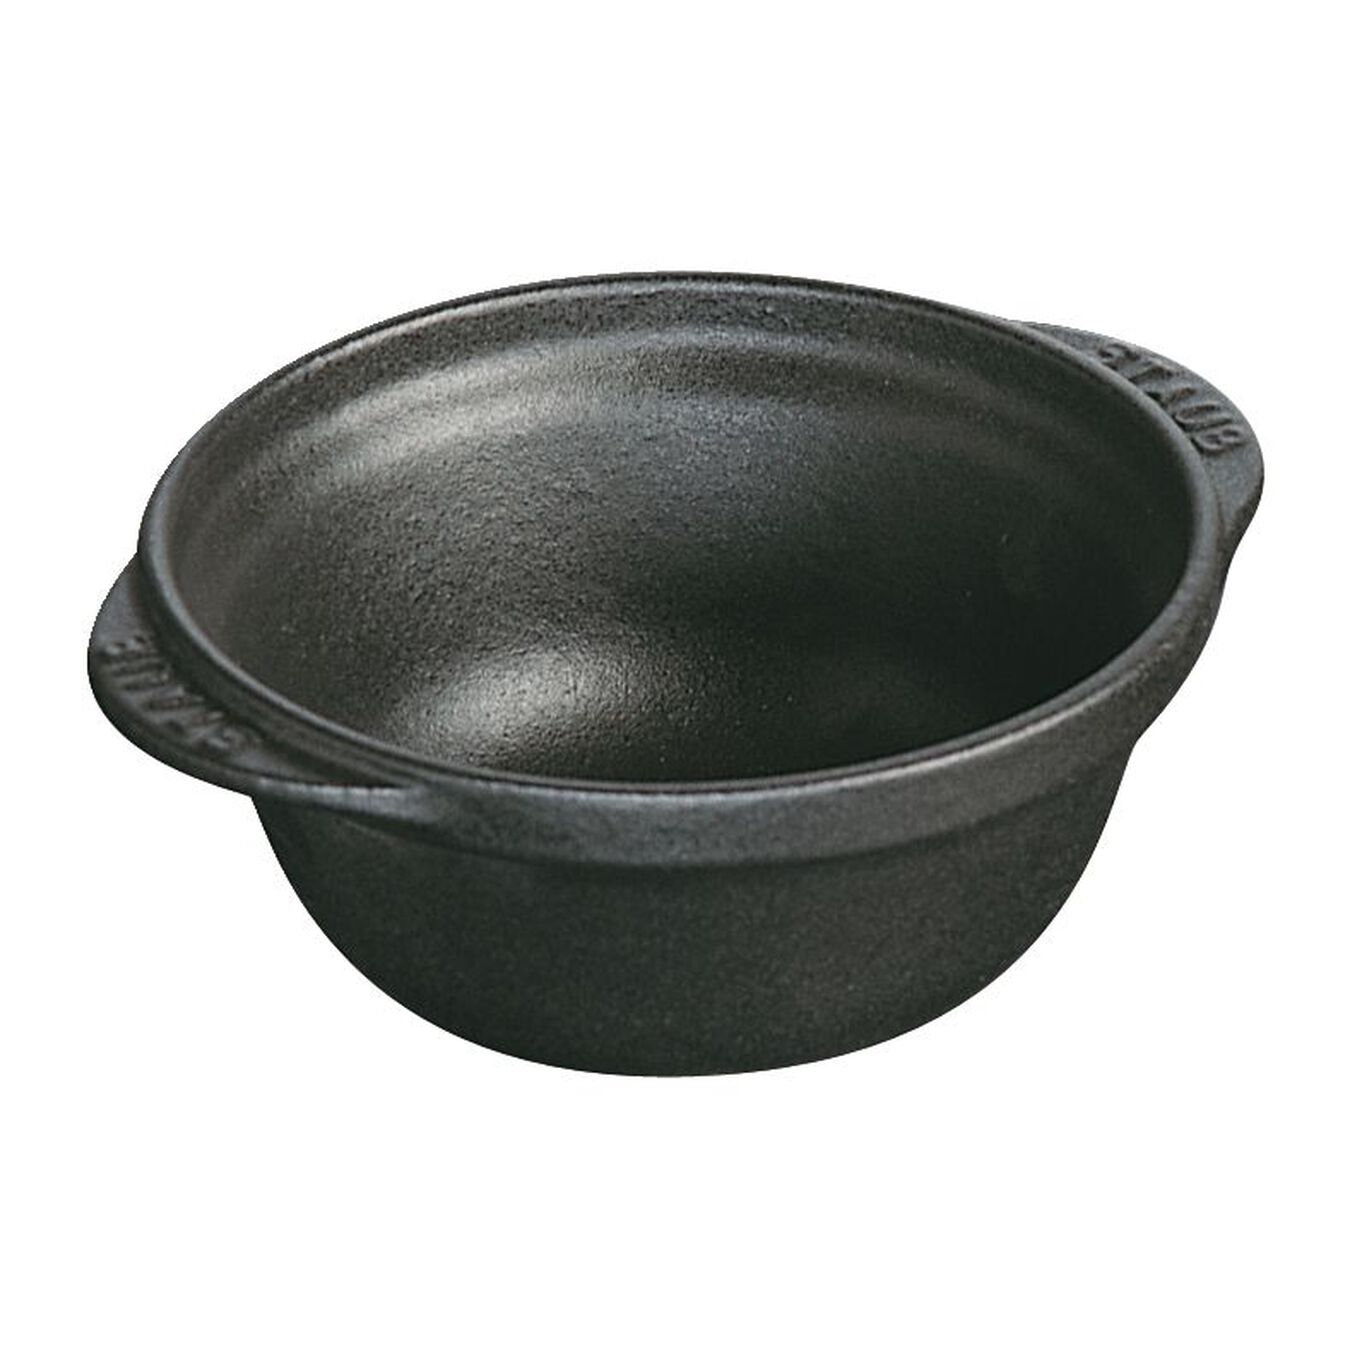 Bol 12 cm, Fonte, Noir,,large 1